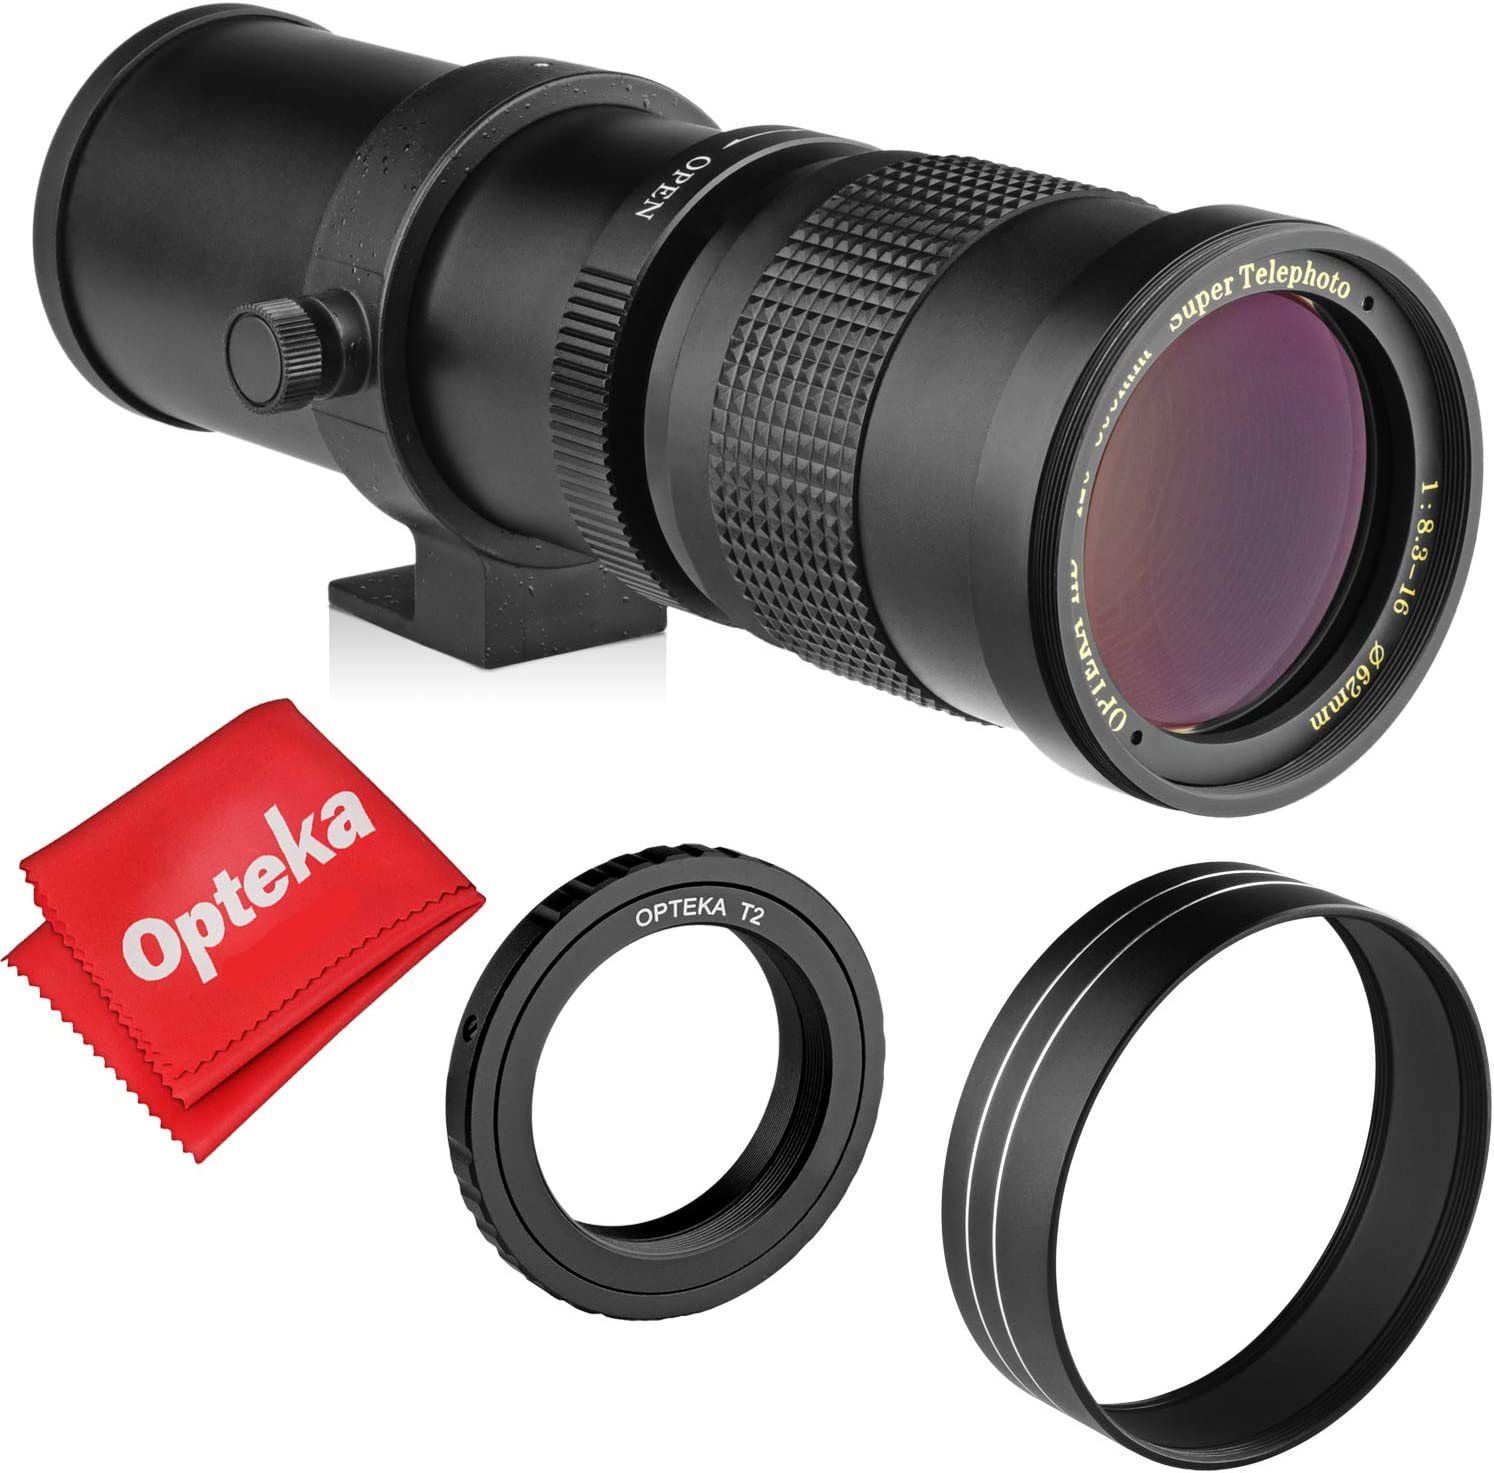 Gadget Place C mount Lens Adapter for Panasonic Lumix DMC-GX8 DMC-G7 DMC-GF7 DMC-GH4 DMC-GM1 DMC-GX7 DMC-G6 DMC-GF6 DMC-GH3